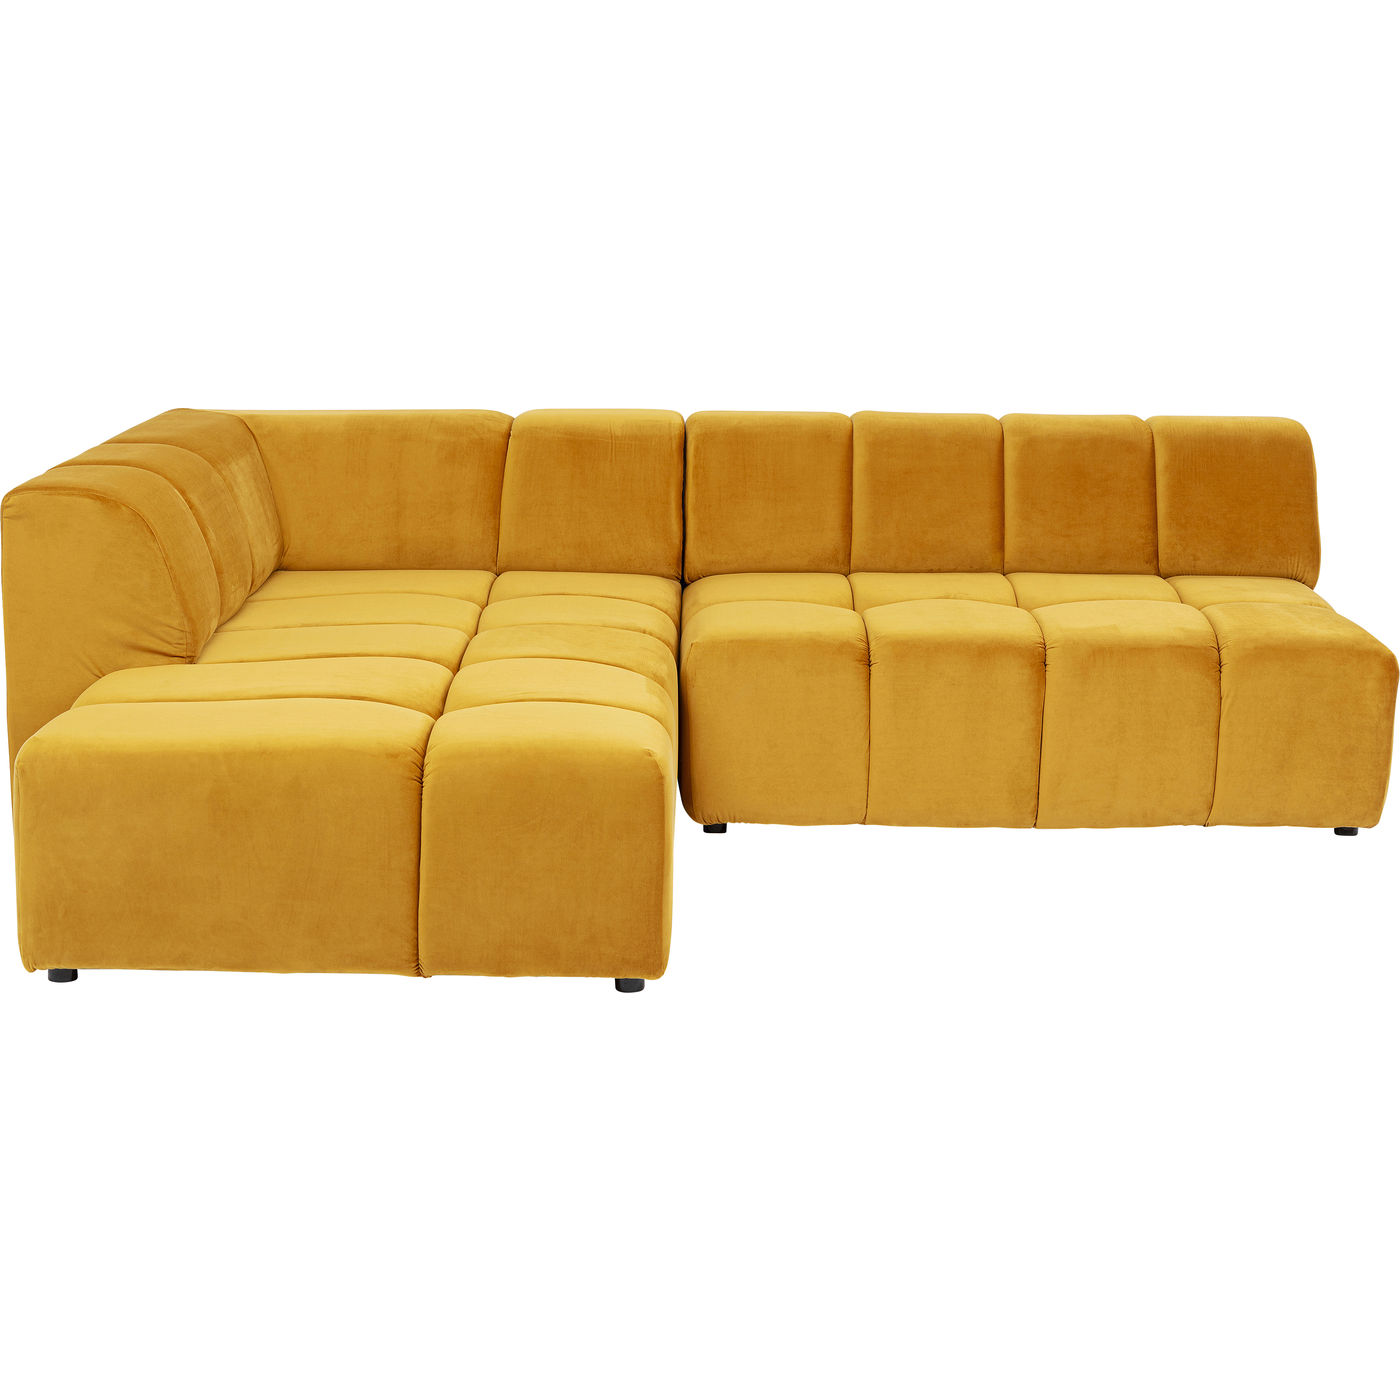 Kare диван угловой bel ami желтый 142211/1